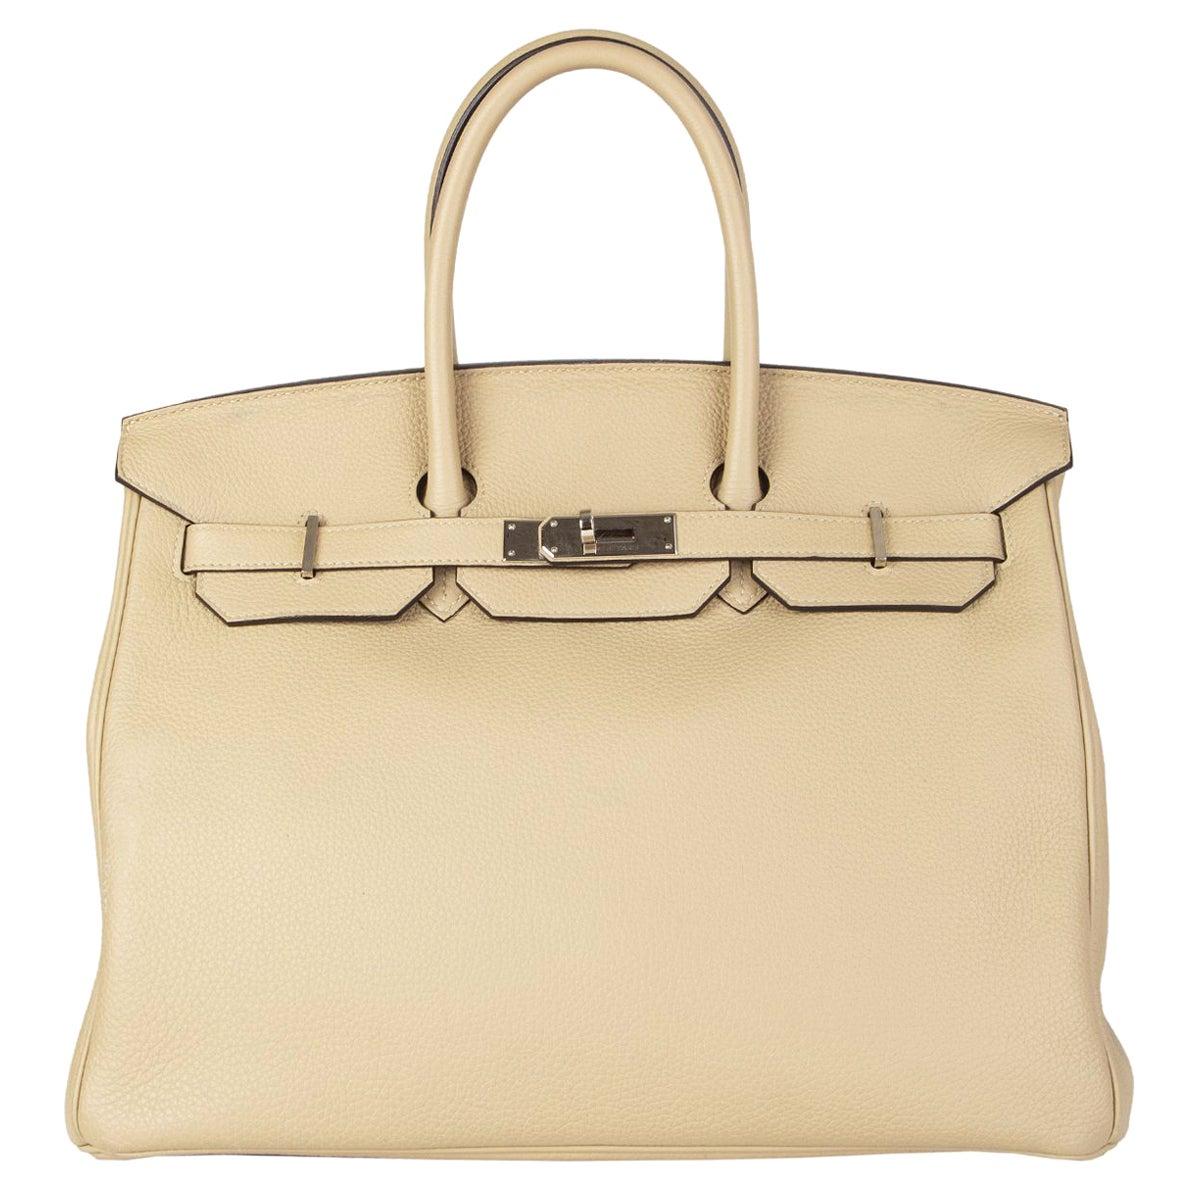 HERMES Trench beige & Palladium leather BIRKIN 35 Tote Bag